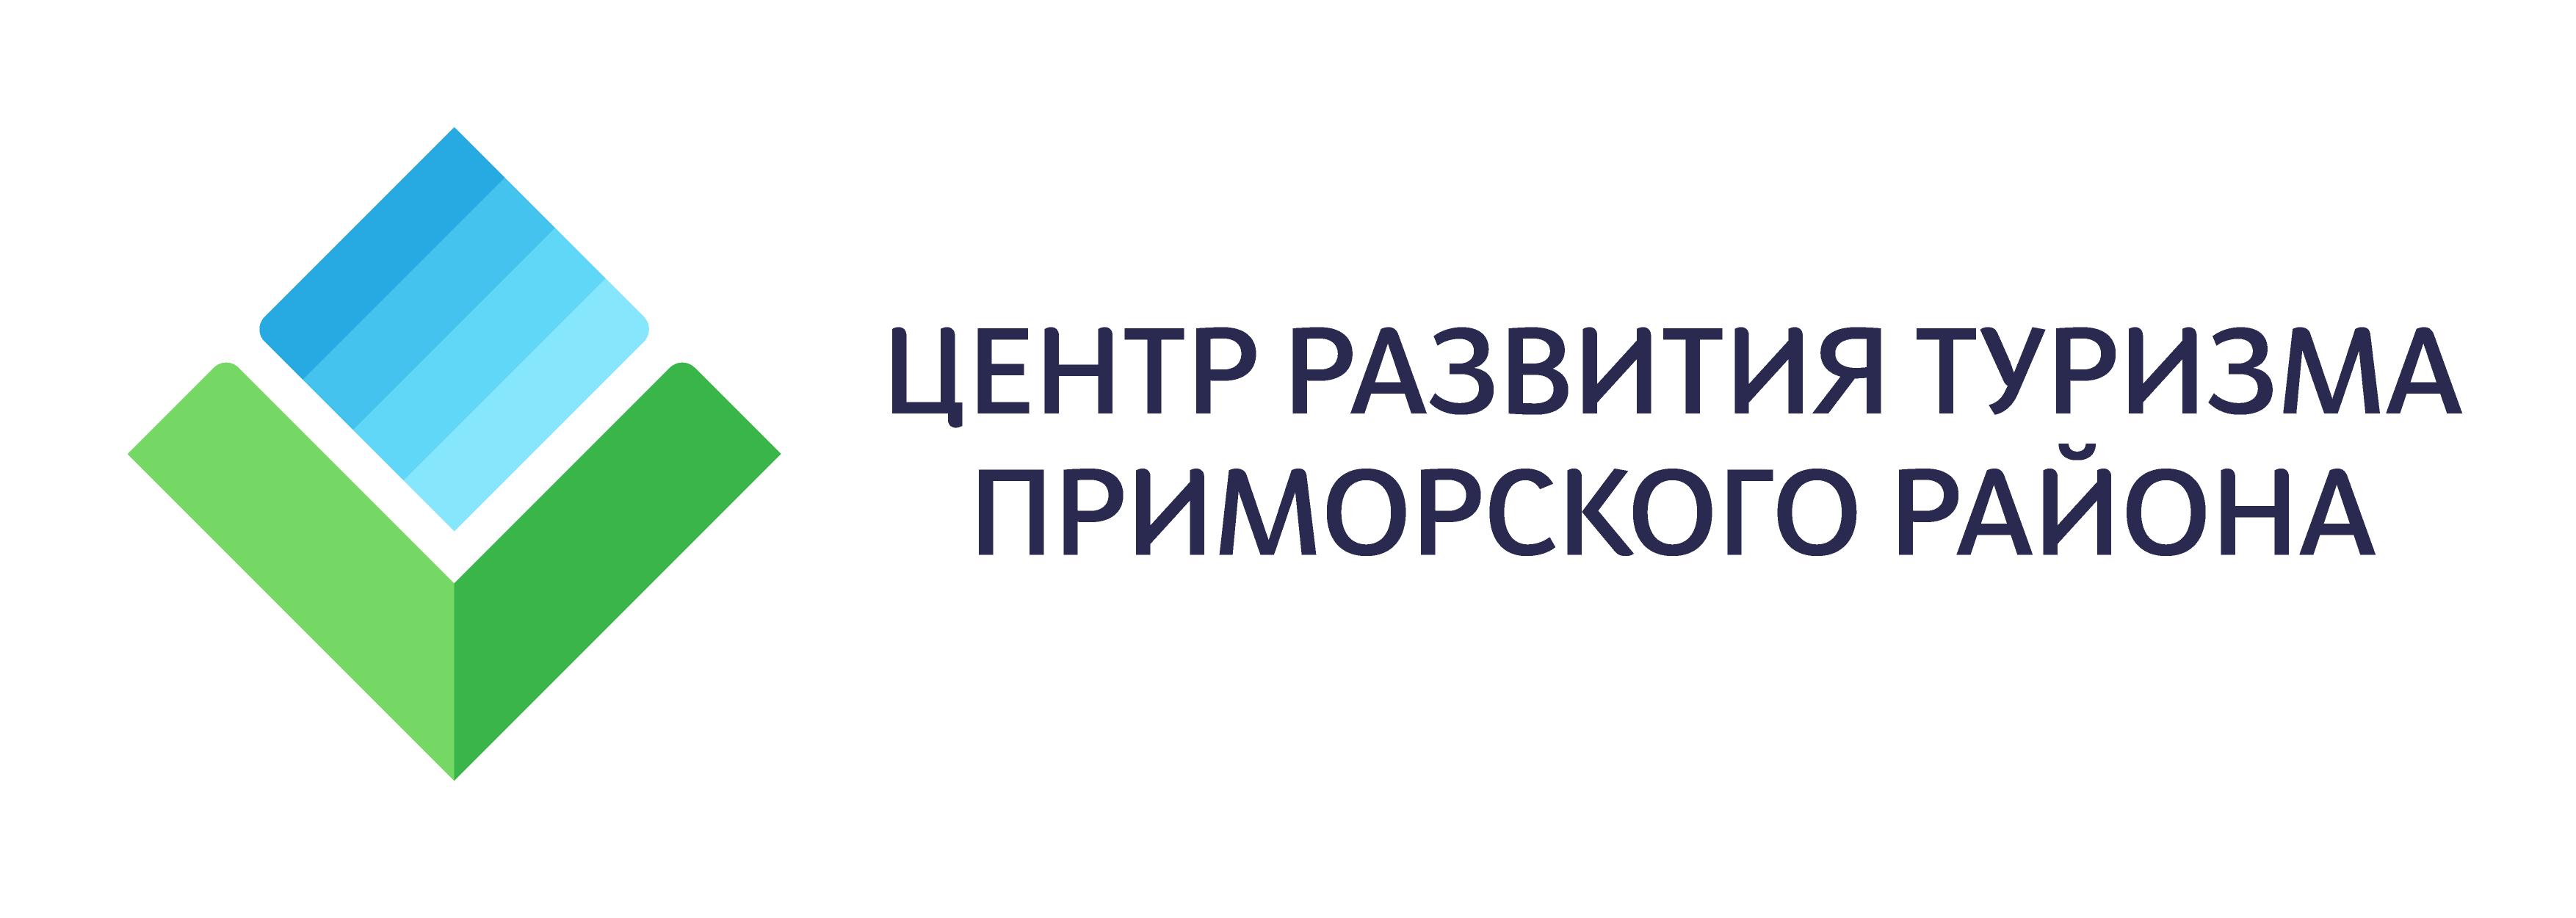 црт_горизонт